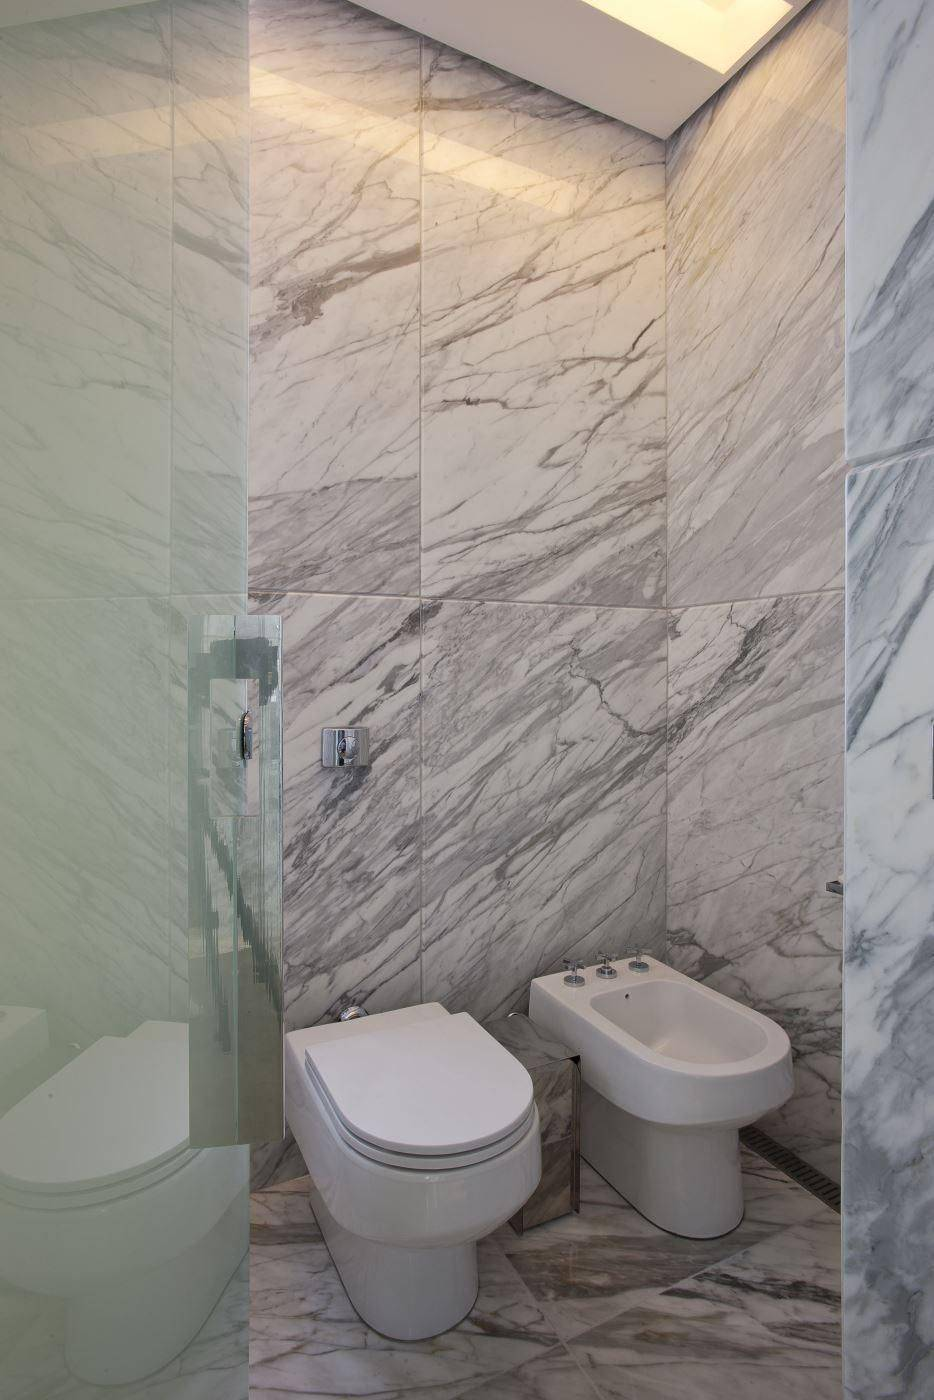 vaso sanitario banheiro gislene lopes 69973